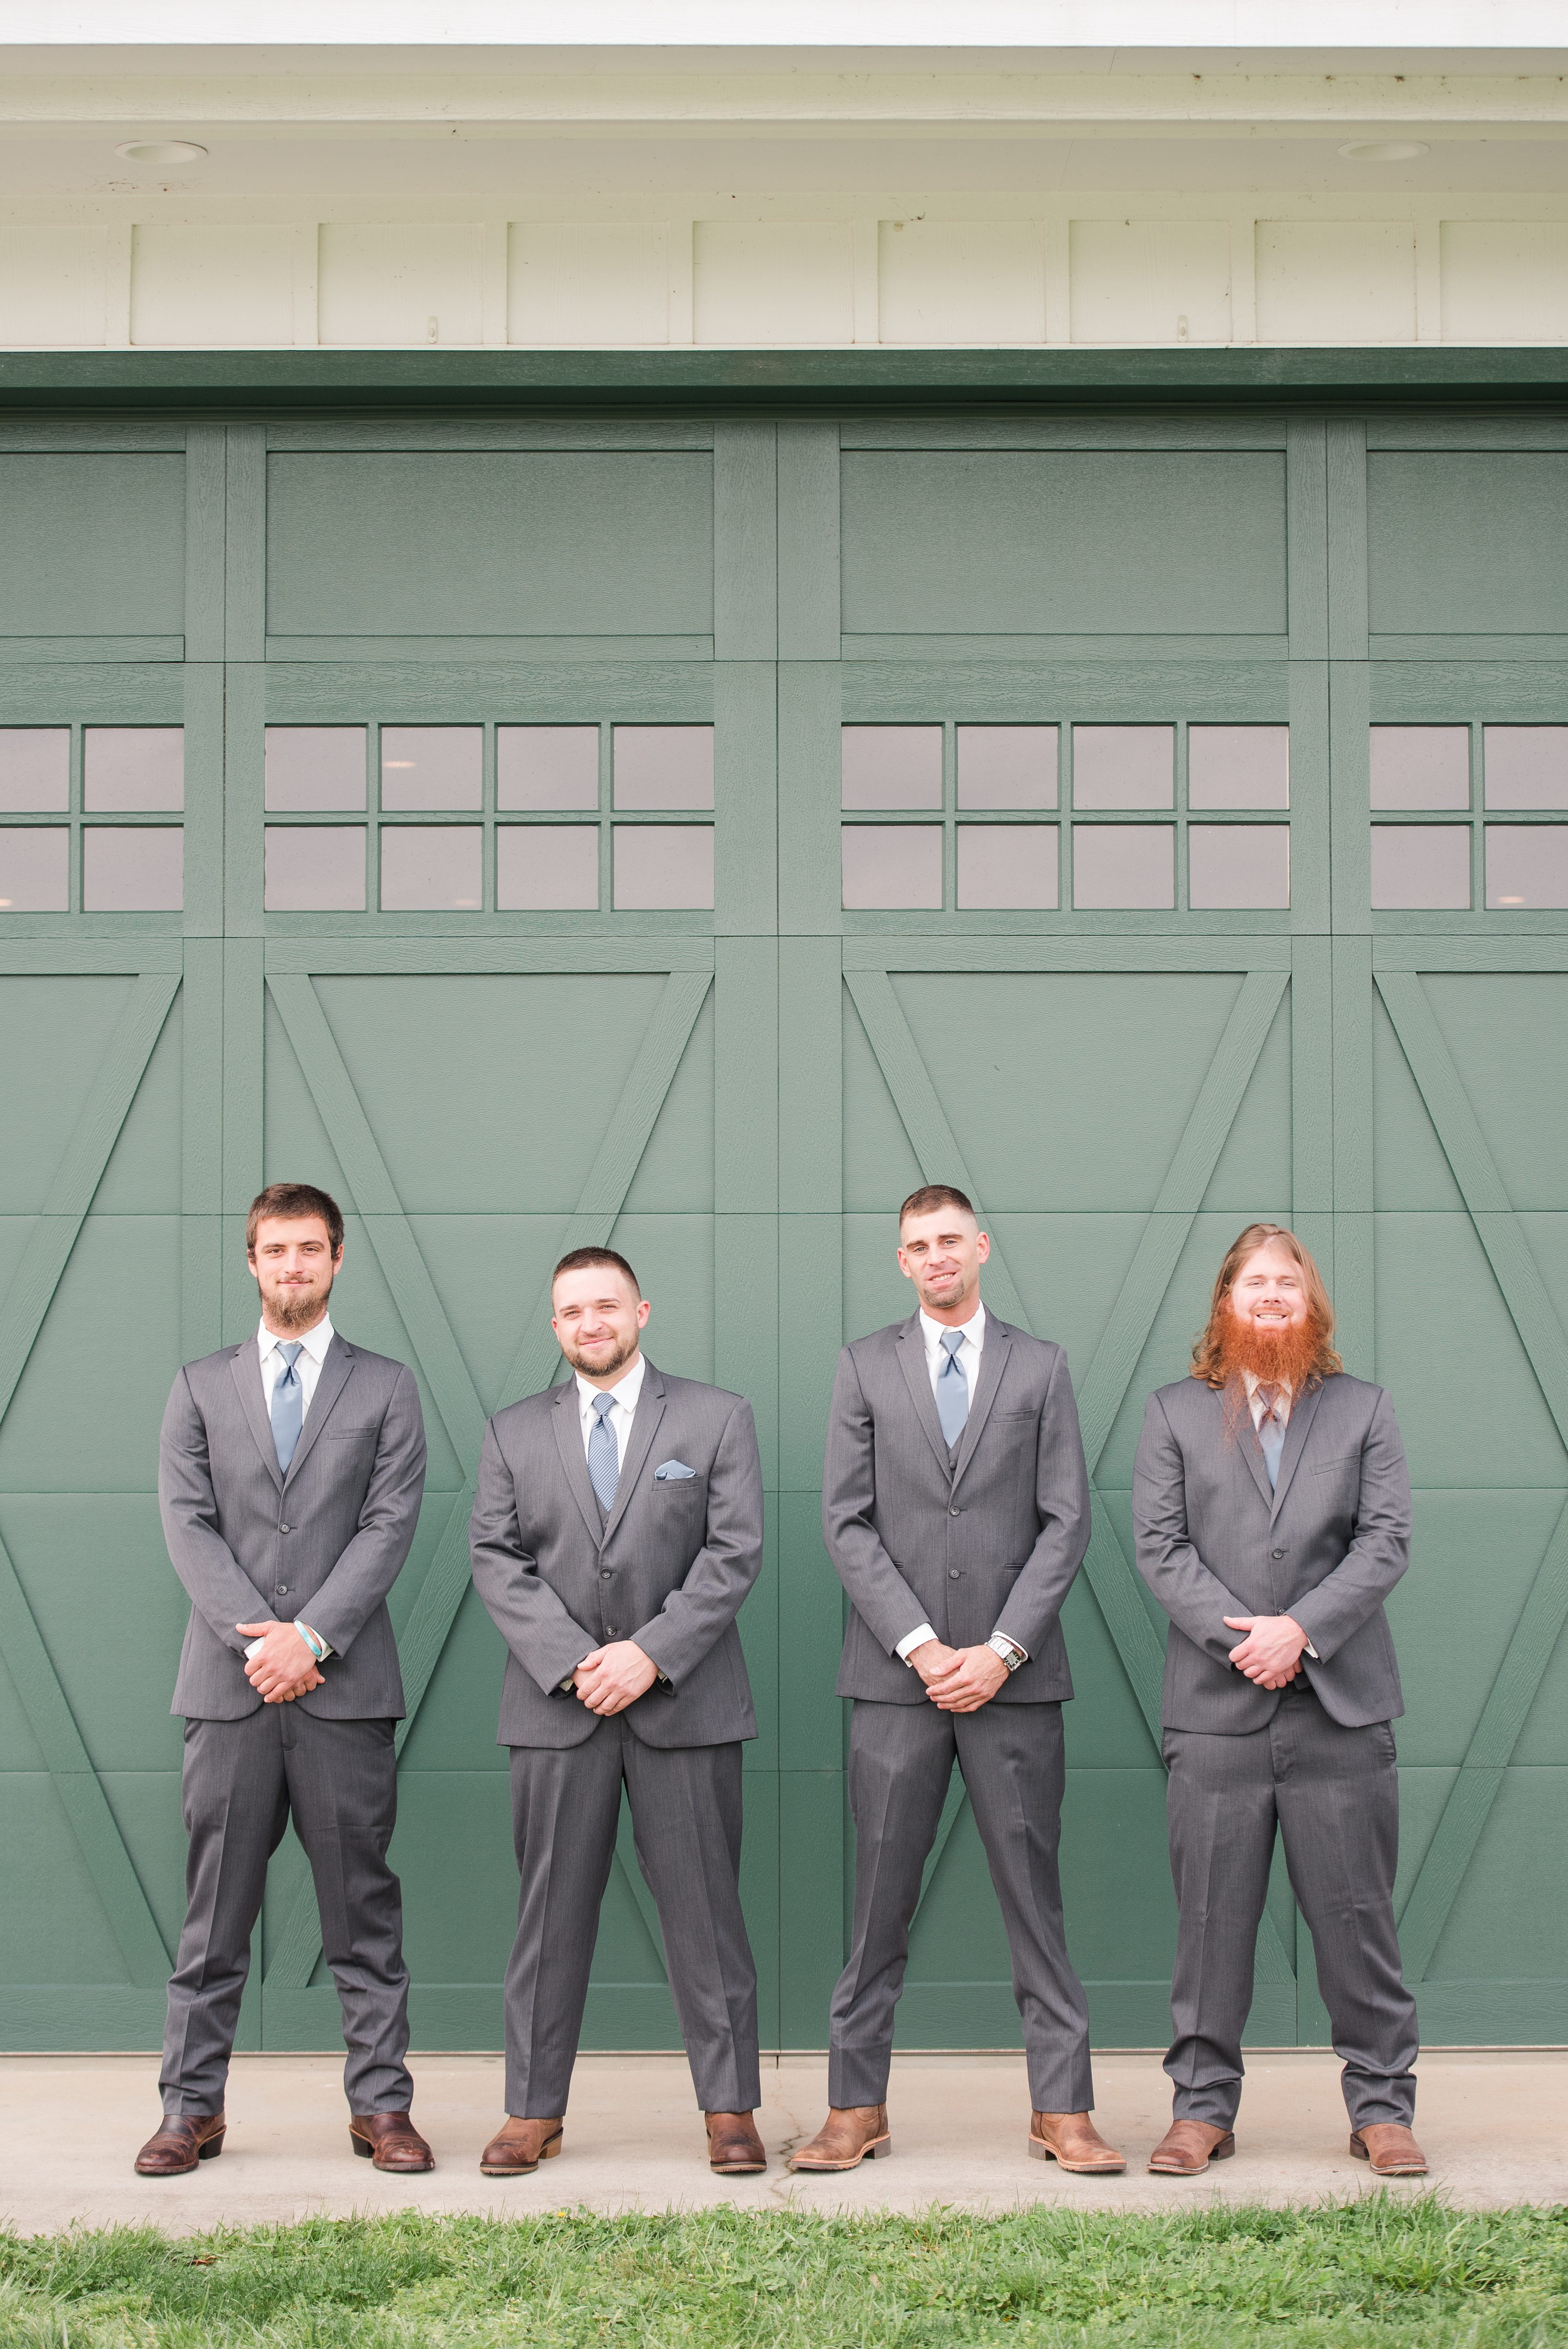 Southern Wedding,groom,groom and groomsmen,groomsmen,Barn at Edgewood,Blue Ridge Mountains Wedding